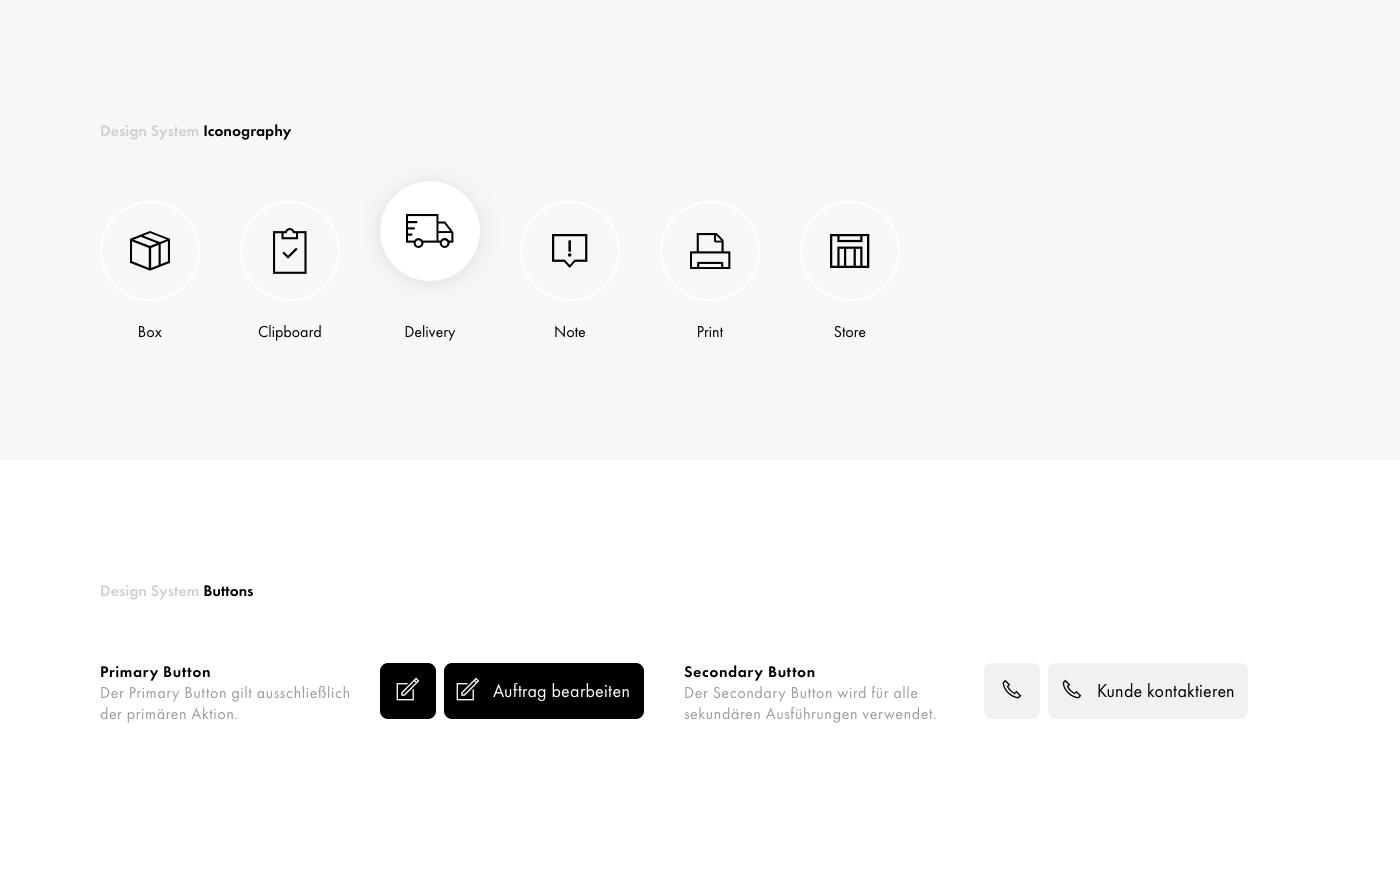 Design System Iconography